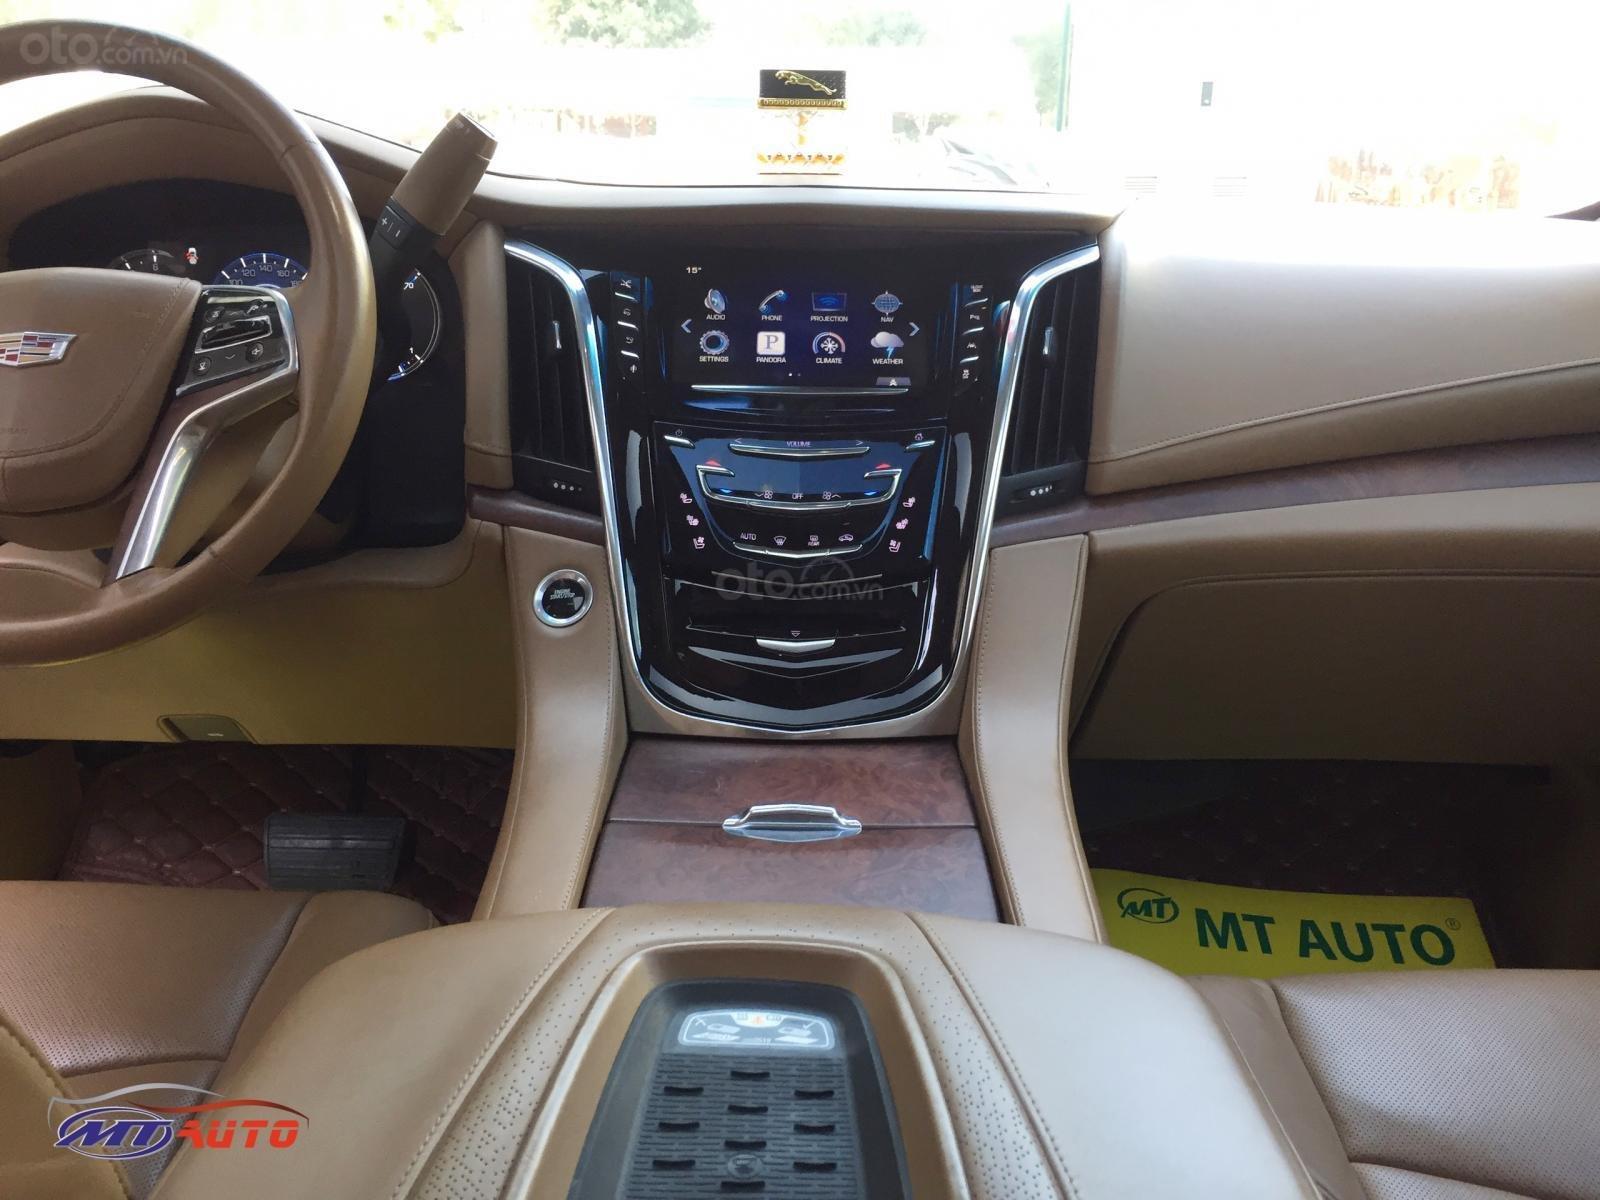 Bán Cadillac Escalade ESV Platinum model 2016, LH em Huân 0981.0101.61 (10)